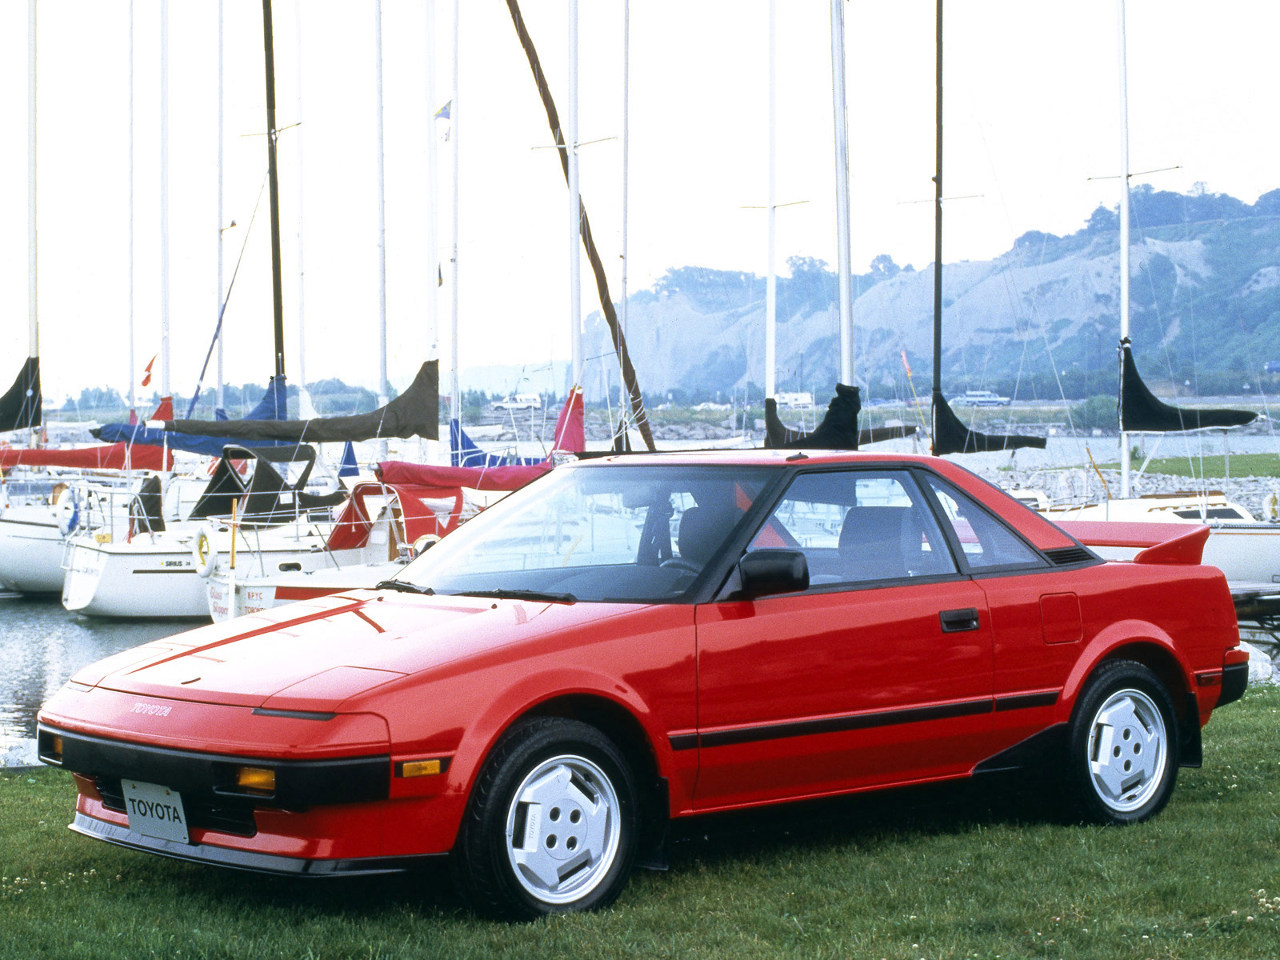 [Image: Toyota%2BMR2%2B85%2B%2528us%2529.jpeg]